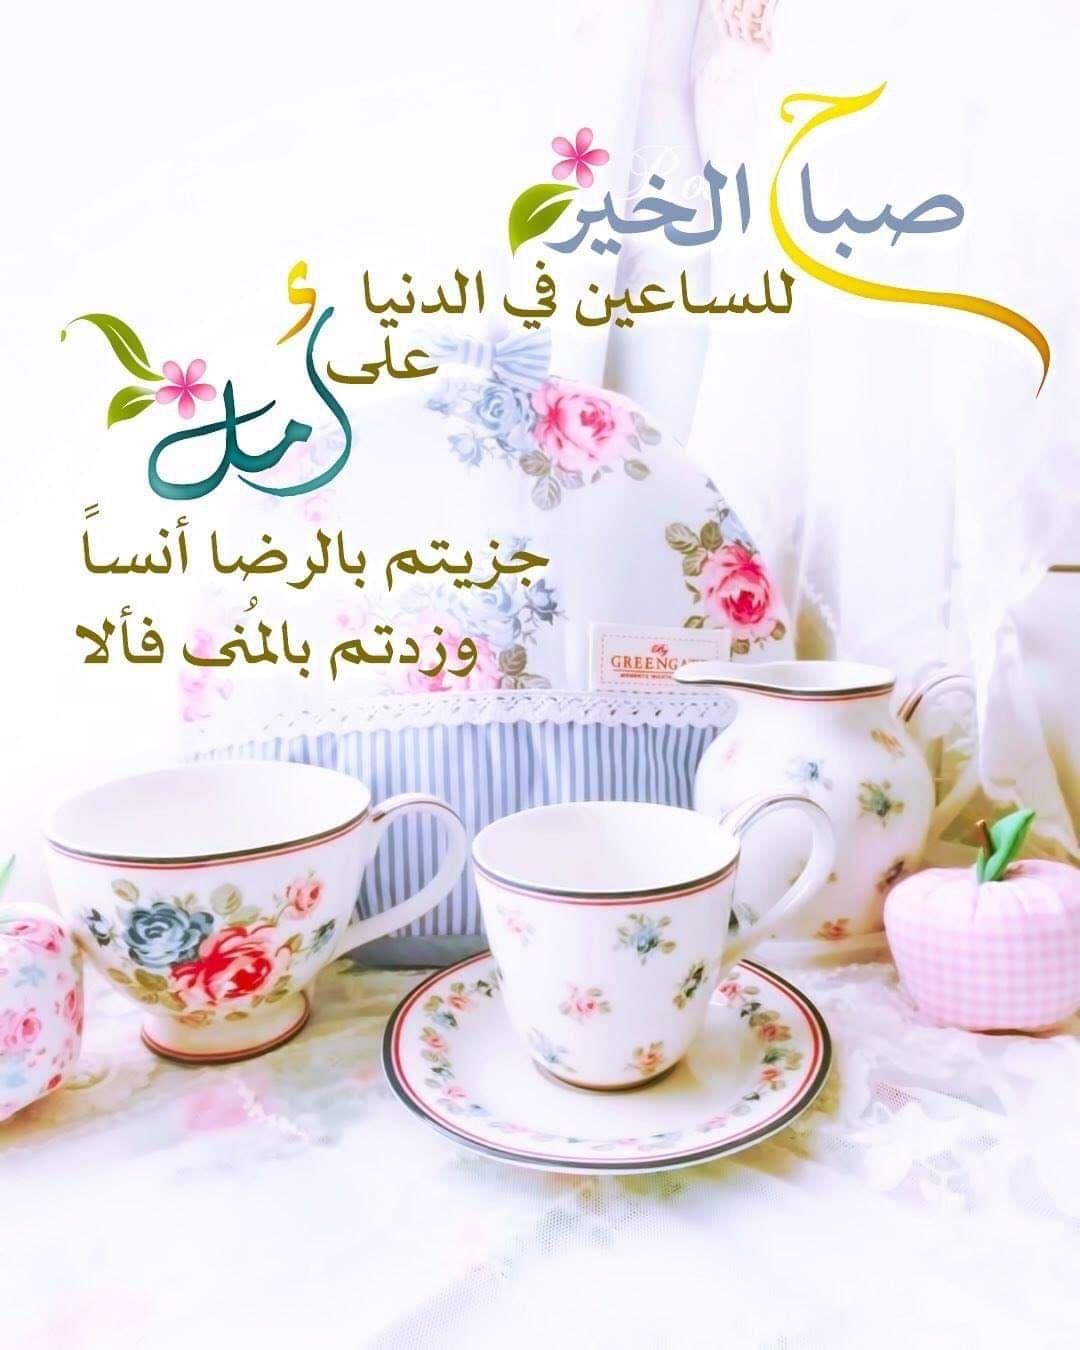 Pin By Mera Al Said On صباح الخير Good Morning Beautiful Morning Messages Morning Greeting School Illustration